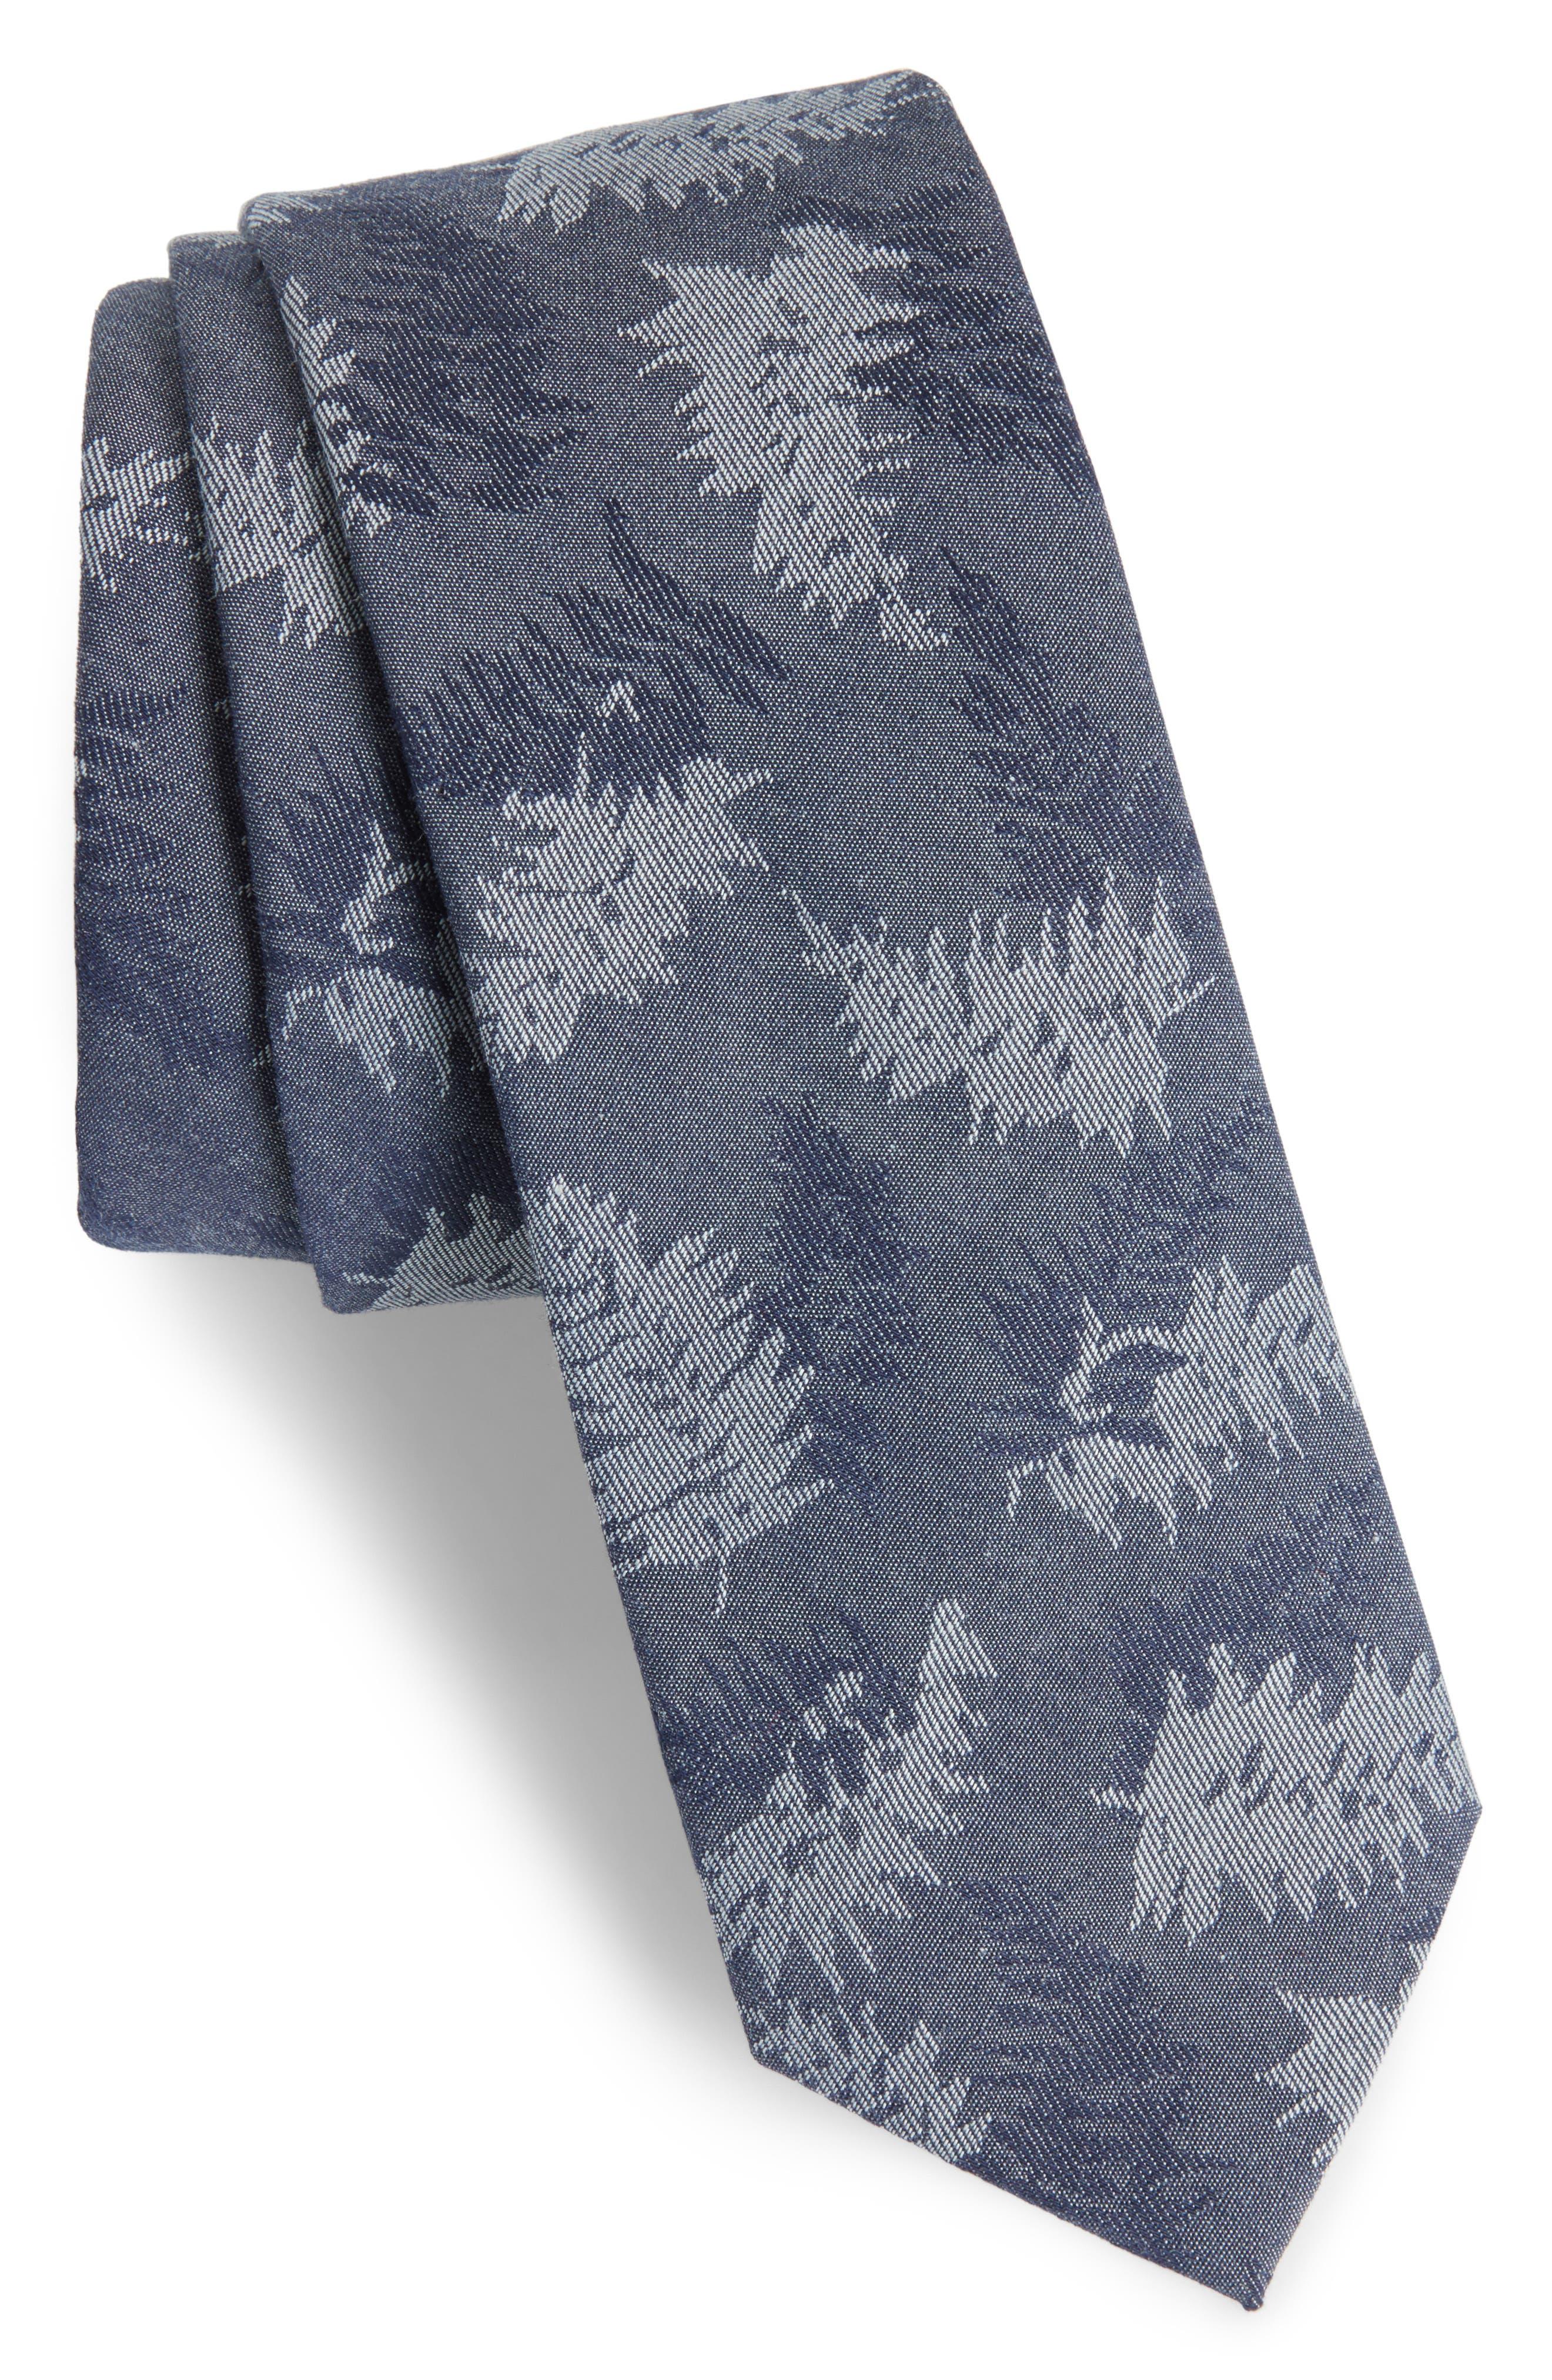 Jody Botanical Print Cotton Tie,                         Main,                         color, 410